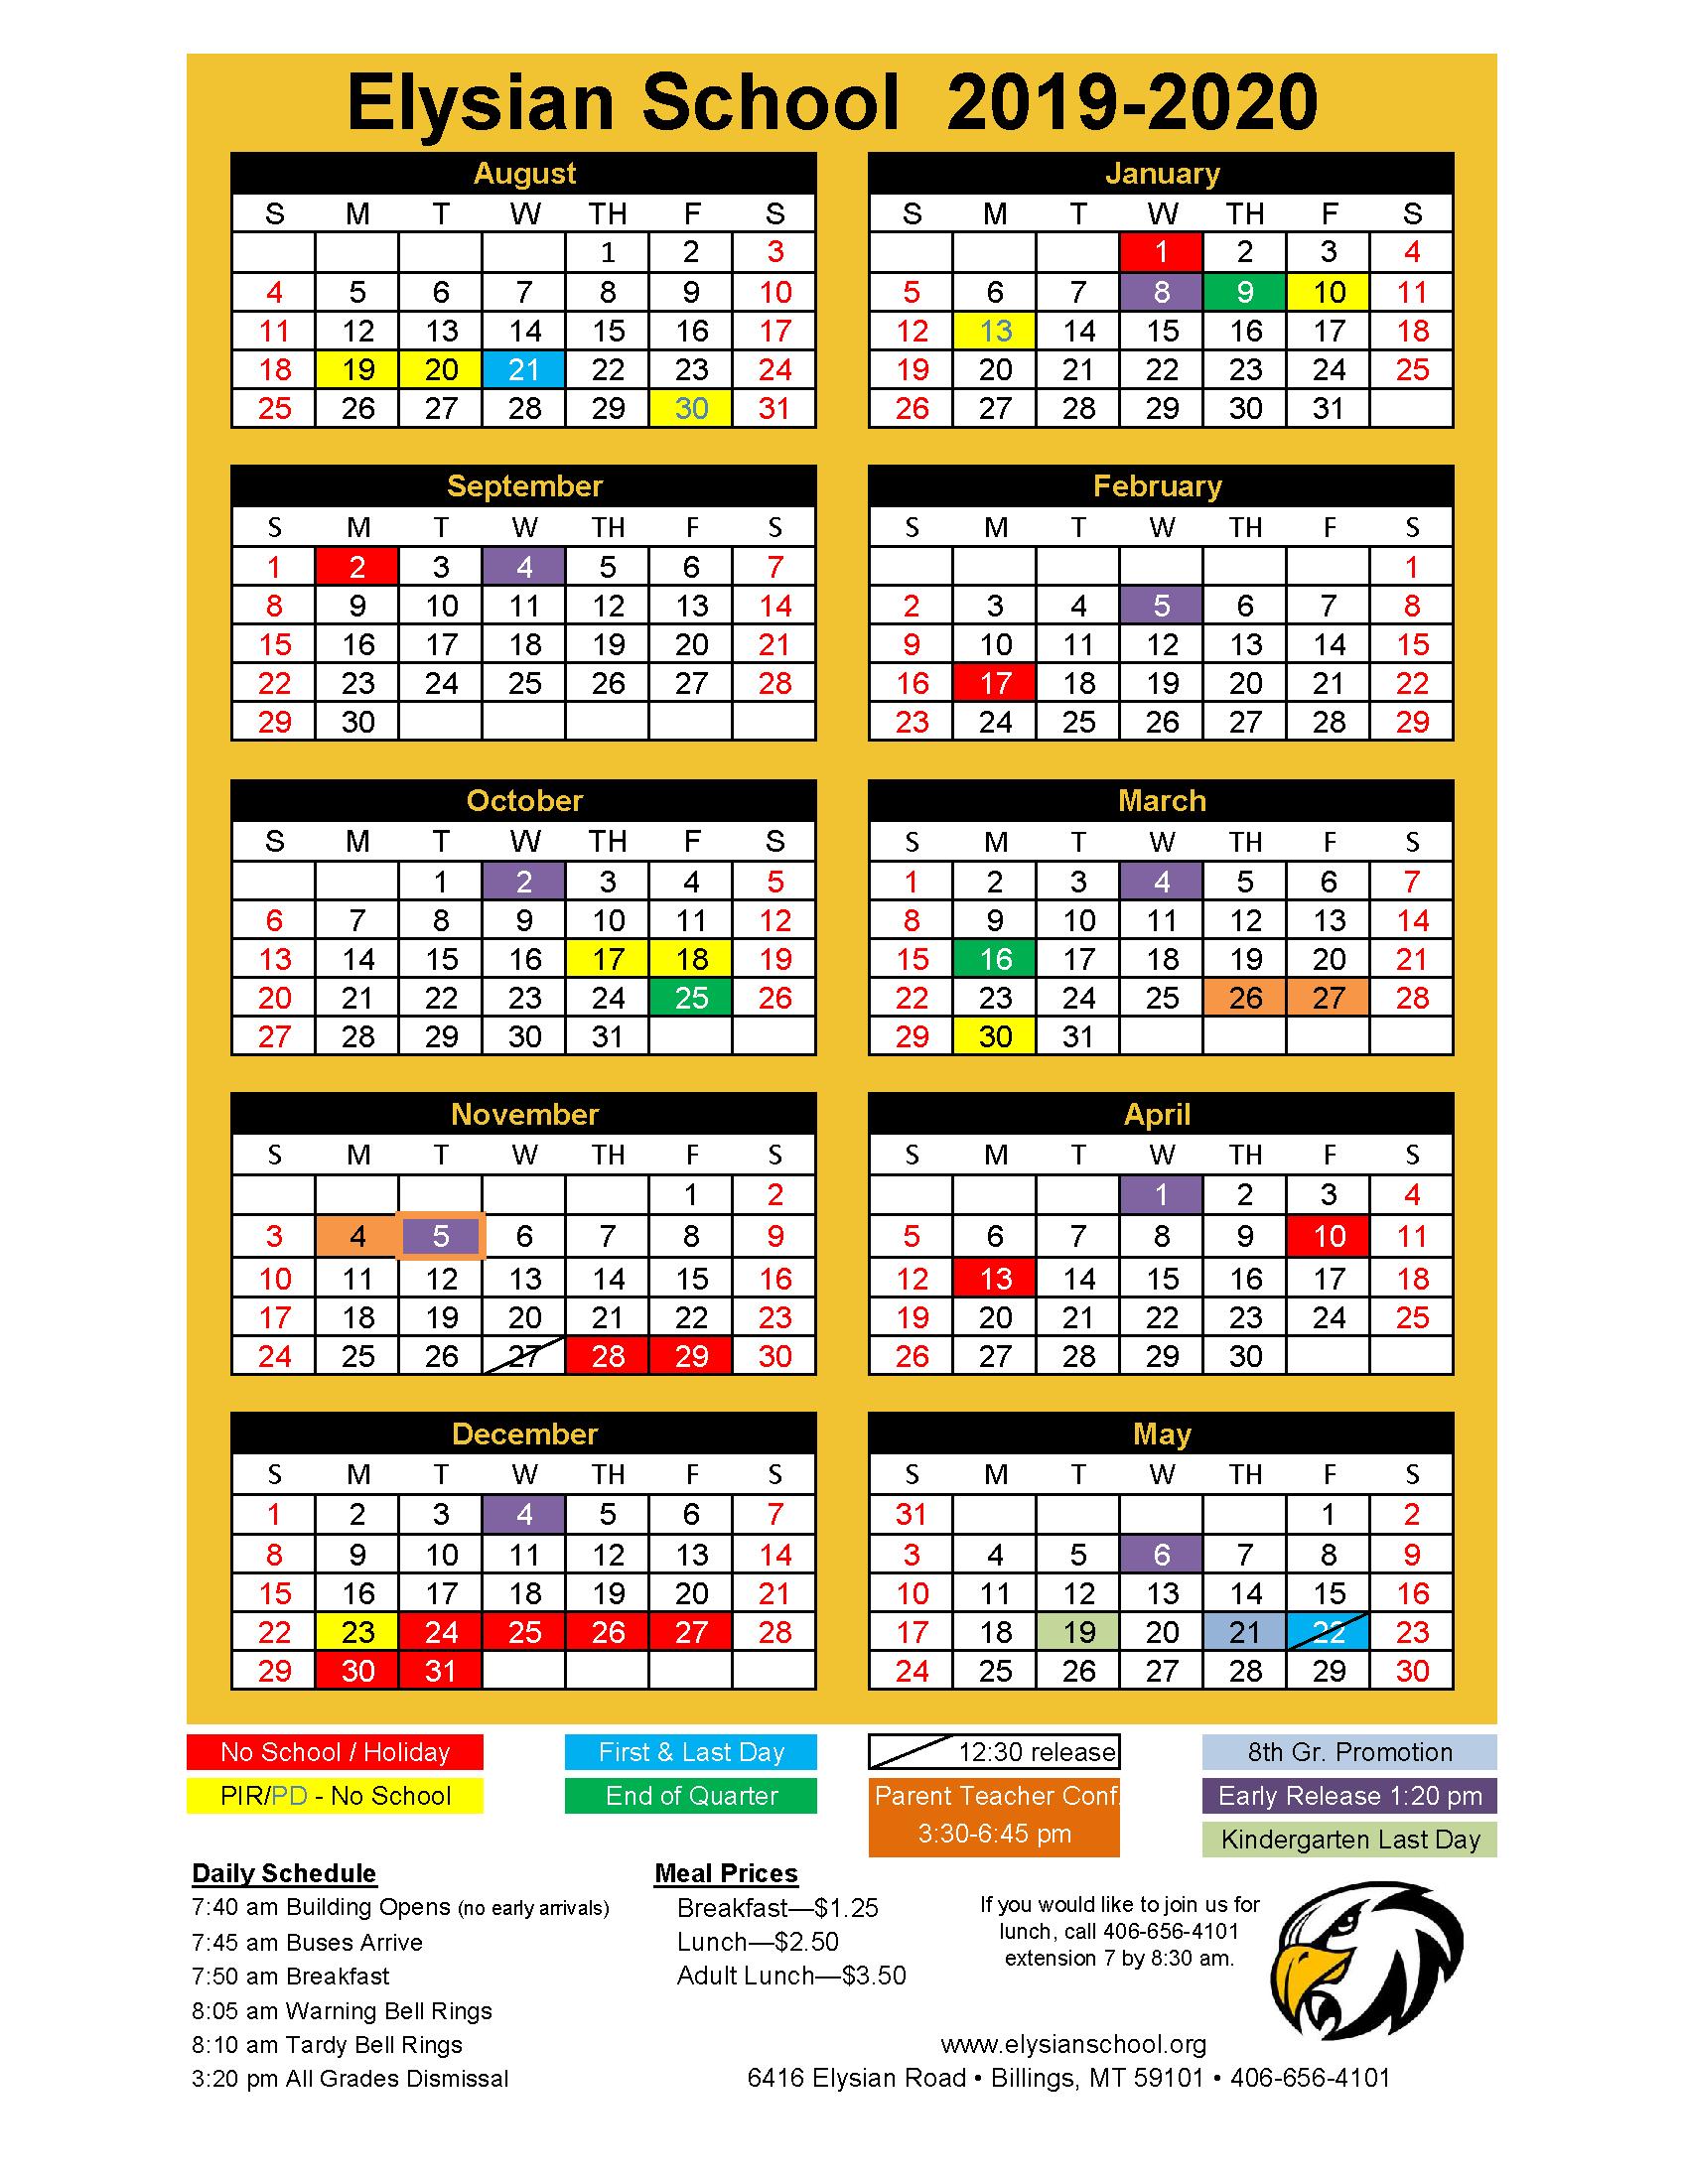 2019 2020 Year Calendar | Elysian School Intended For Billings School District 2 Calander